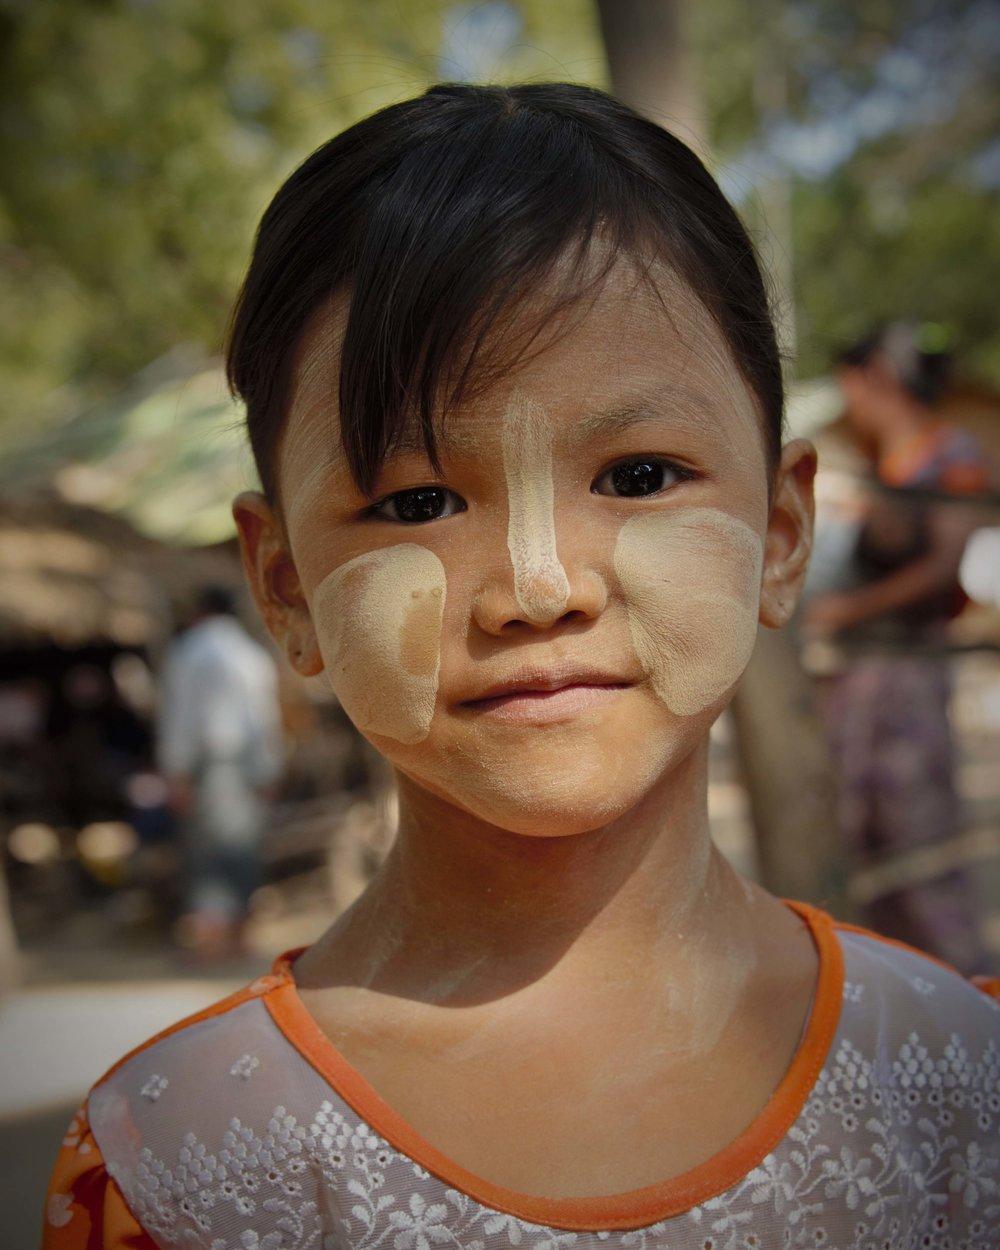 Young girl showing off her tanaka makeup, Bagan, Myanmar